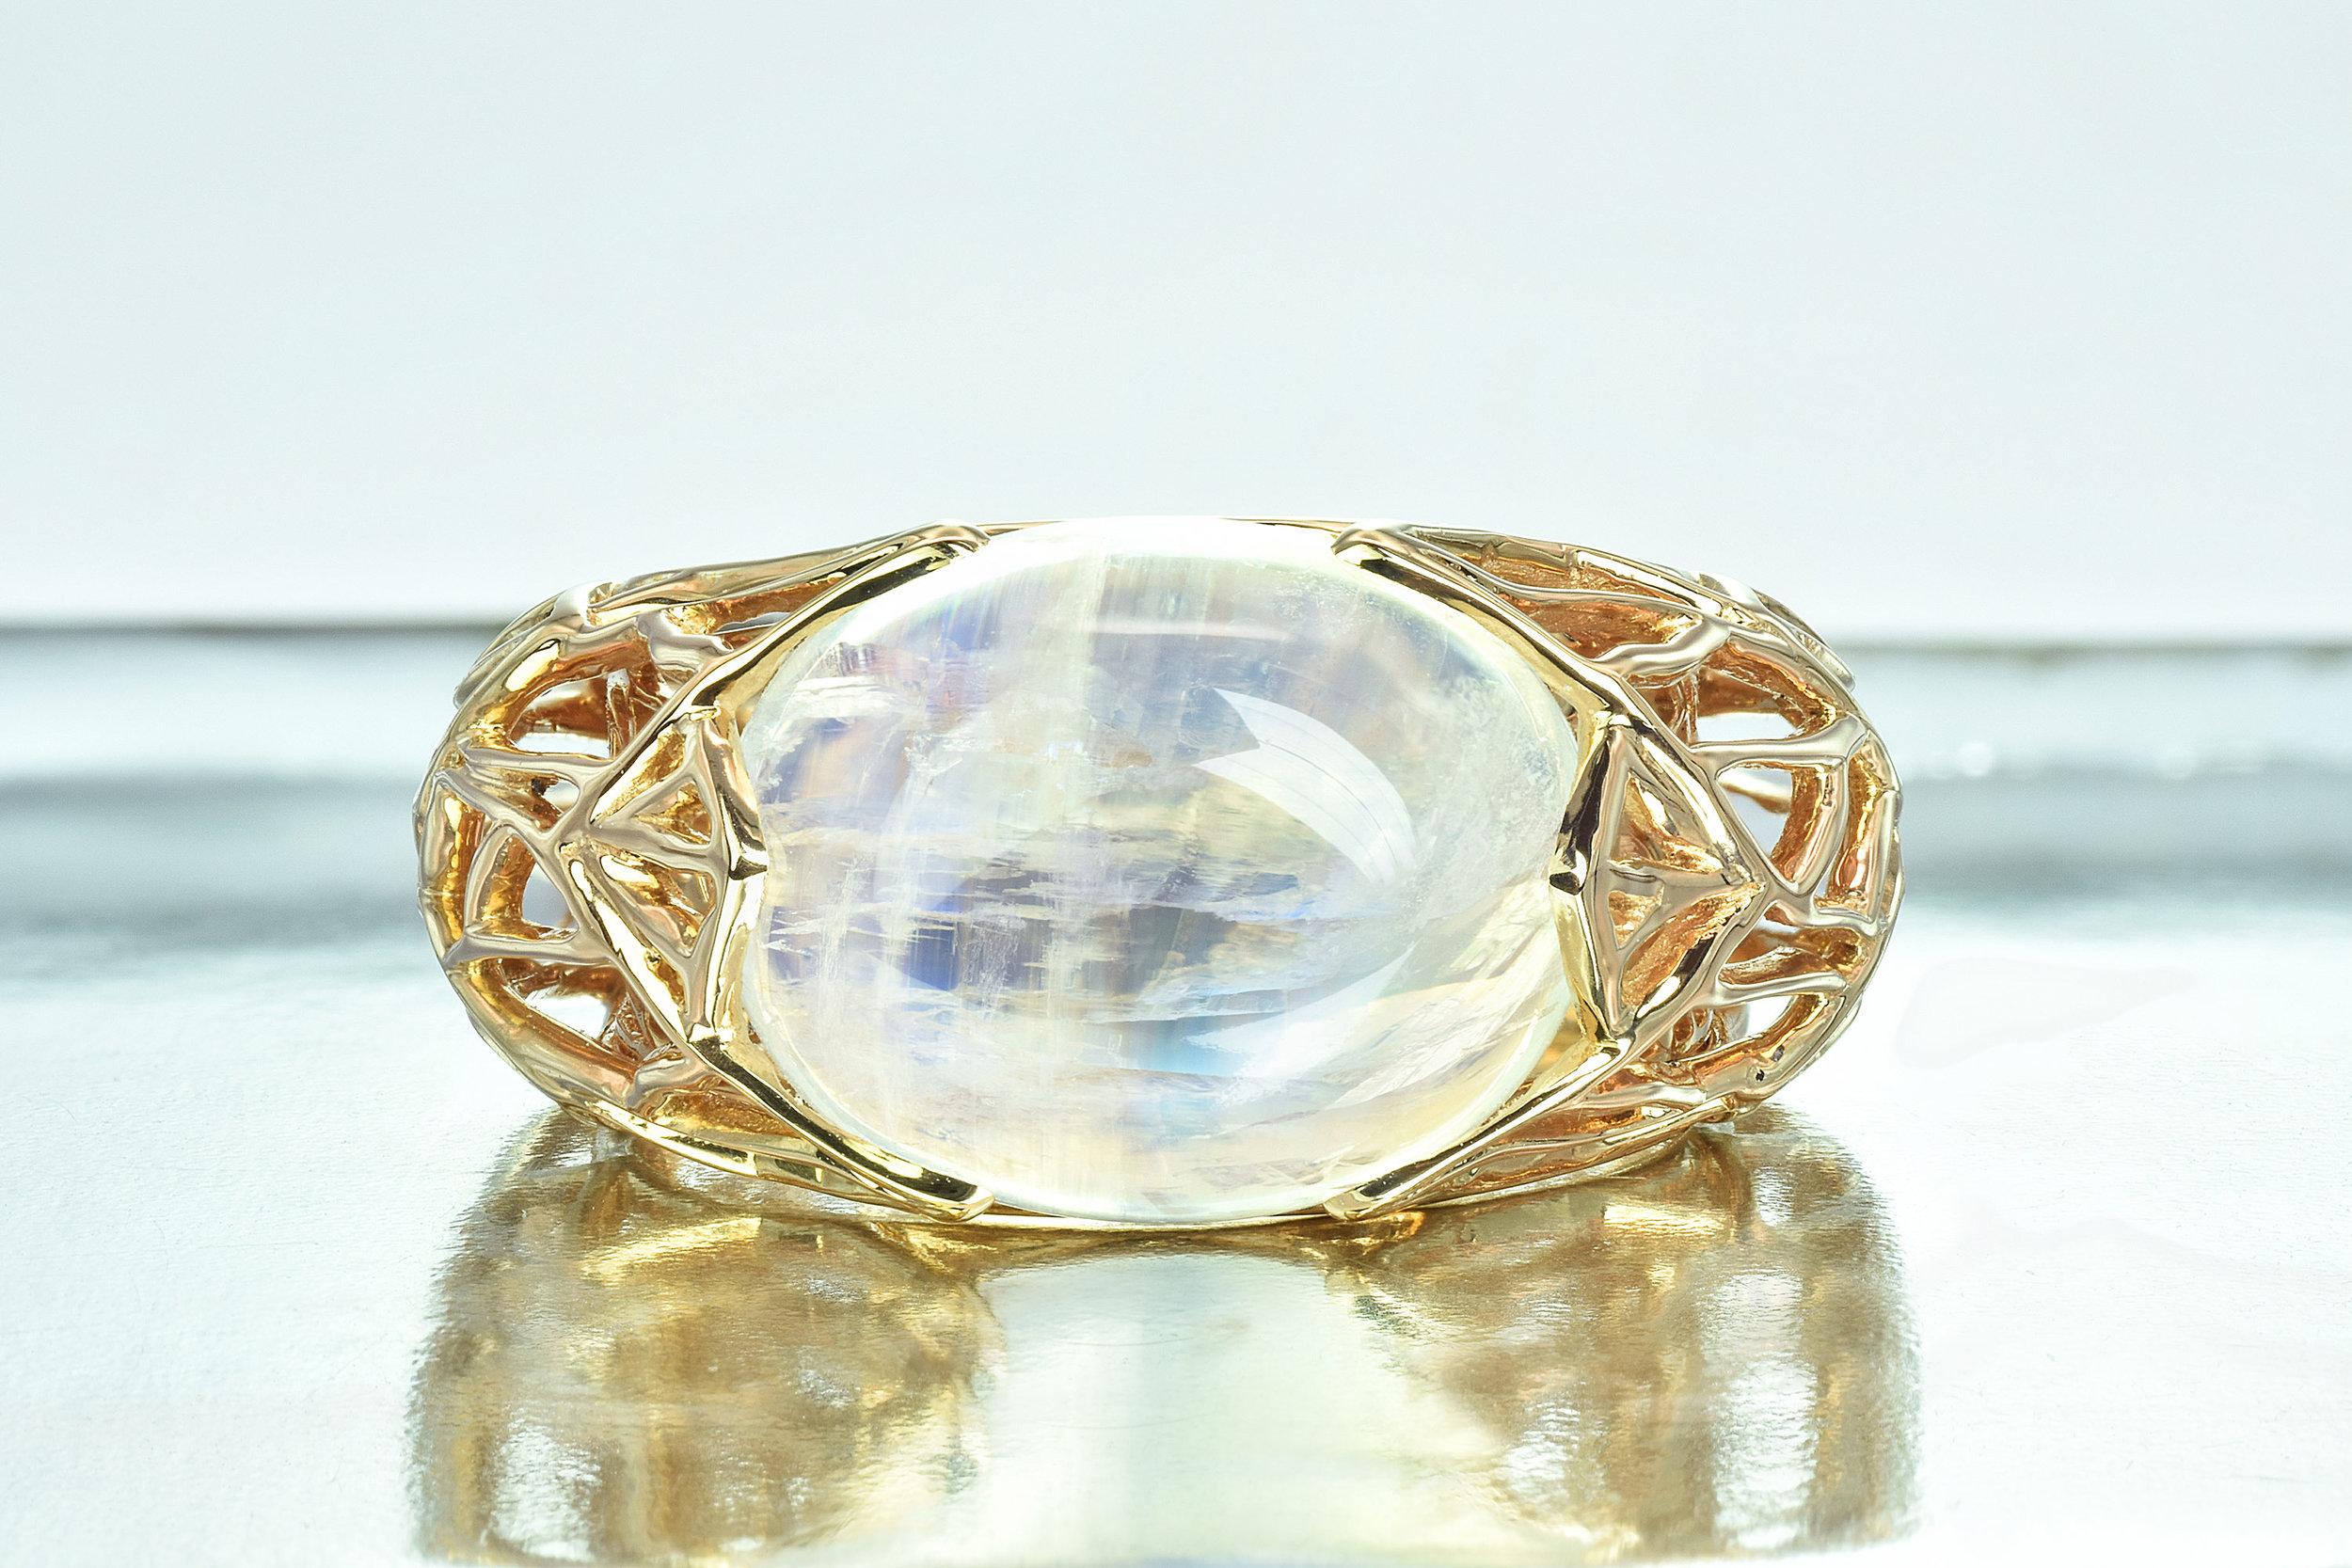 RUBICON Thailand fine jewelry manufacturer since 1987